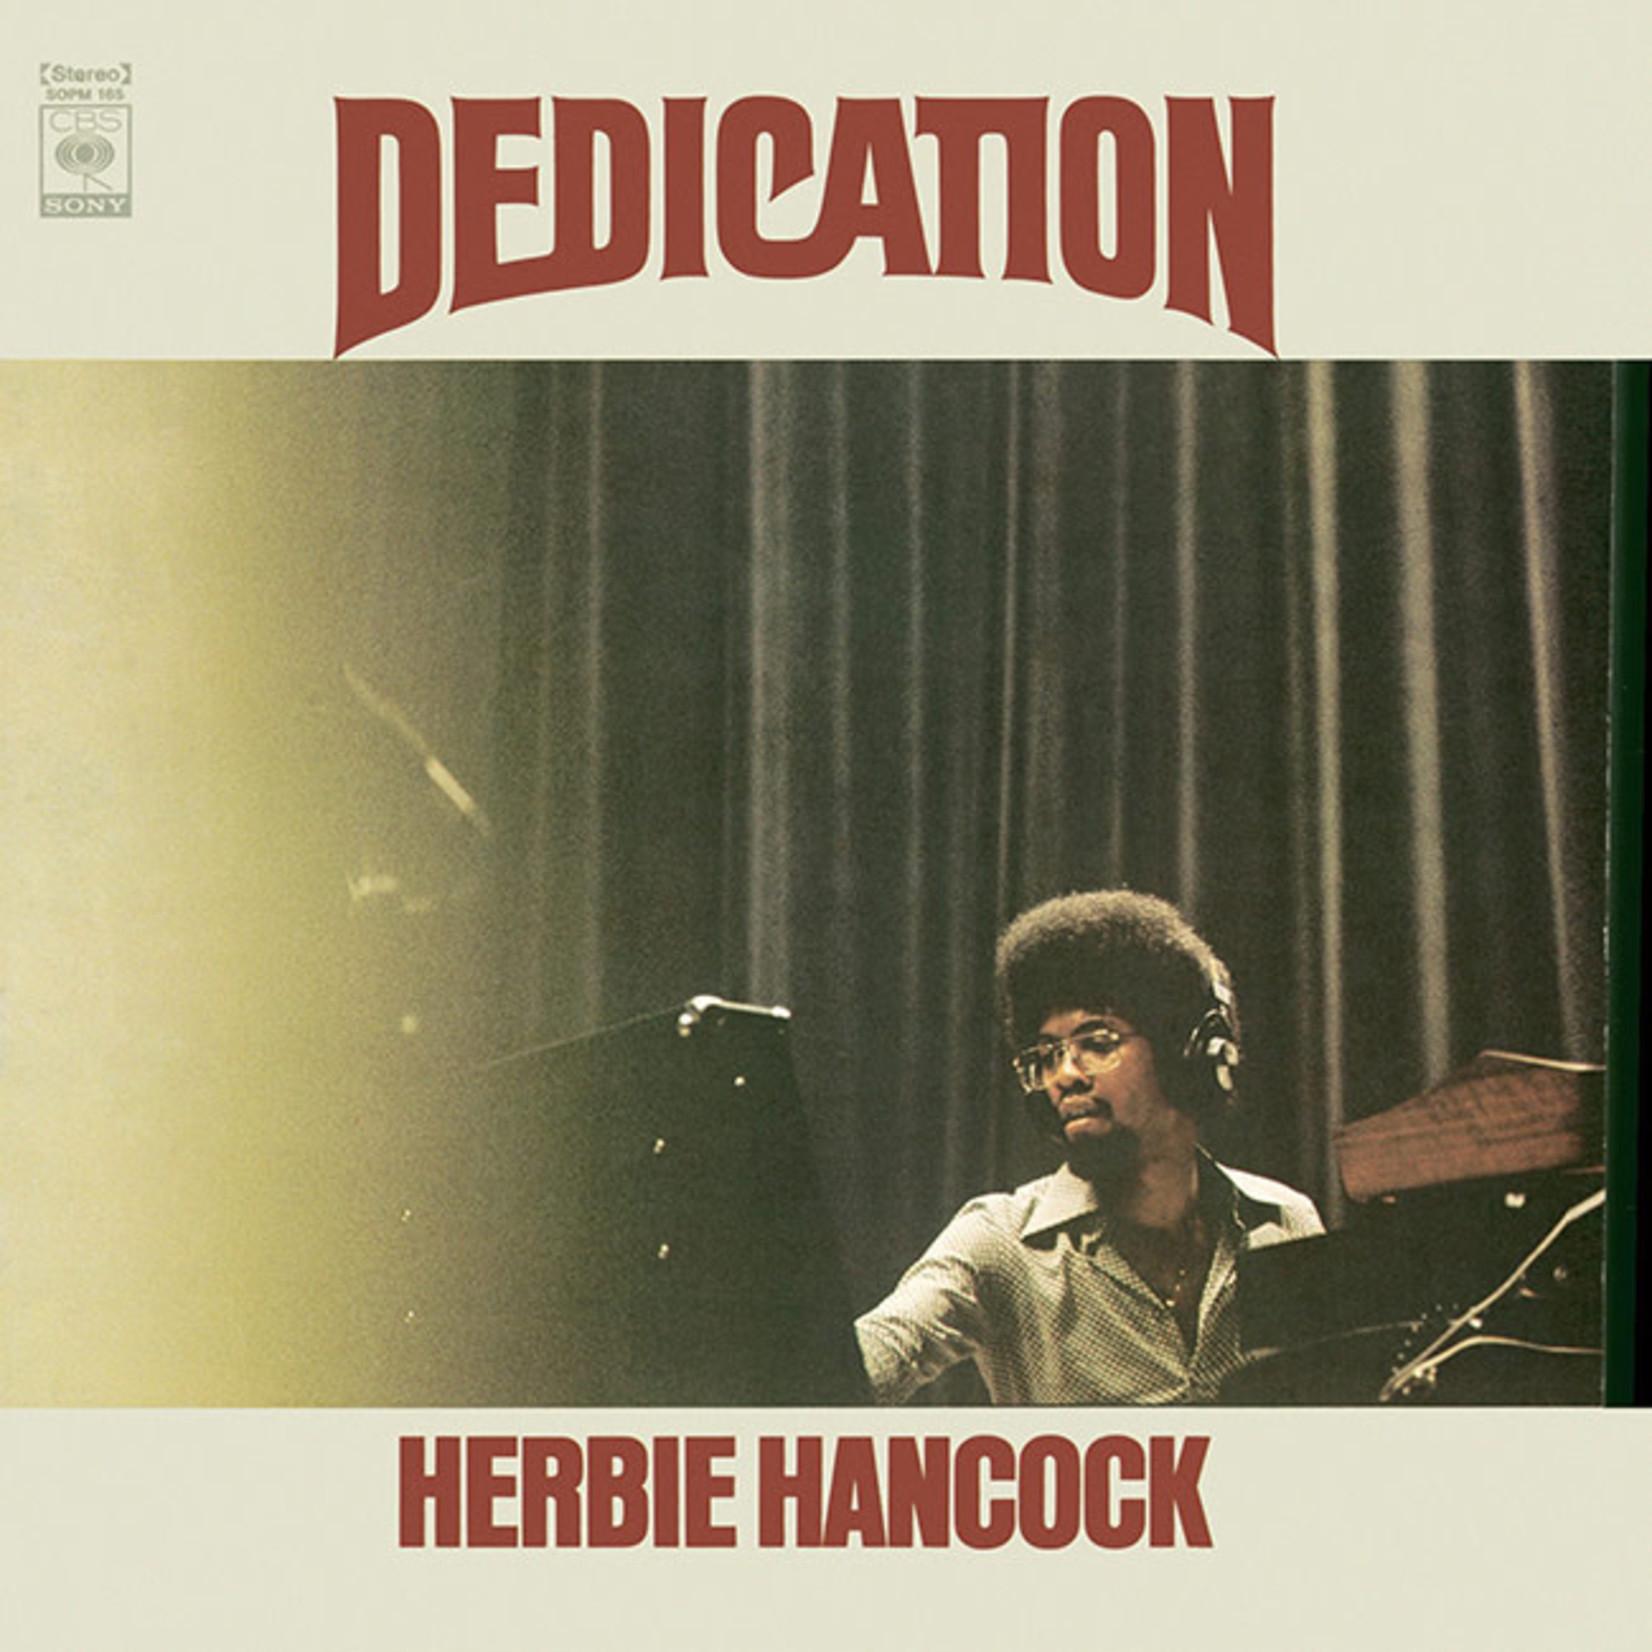 [New] Hancock, Herbie: Dedication